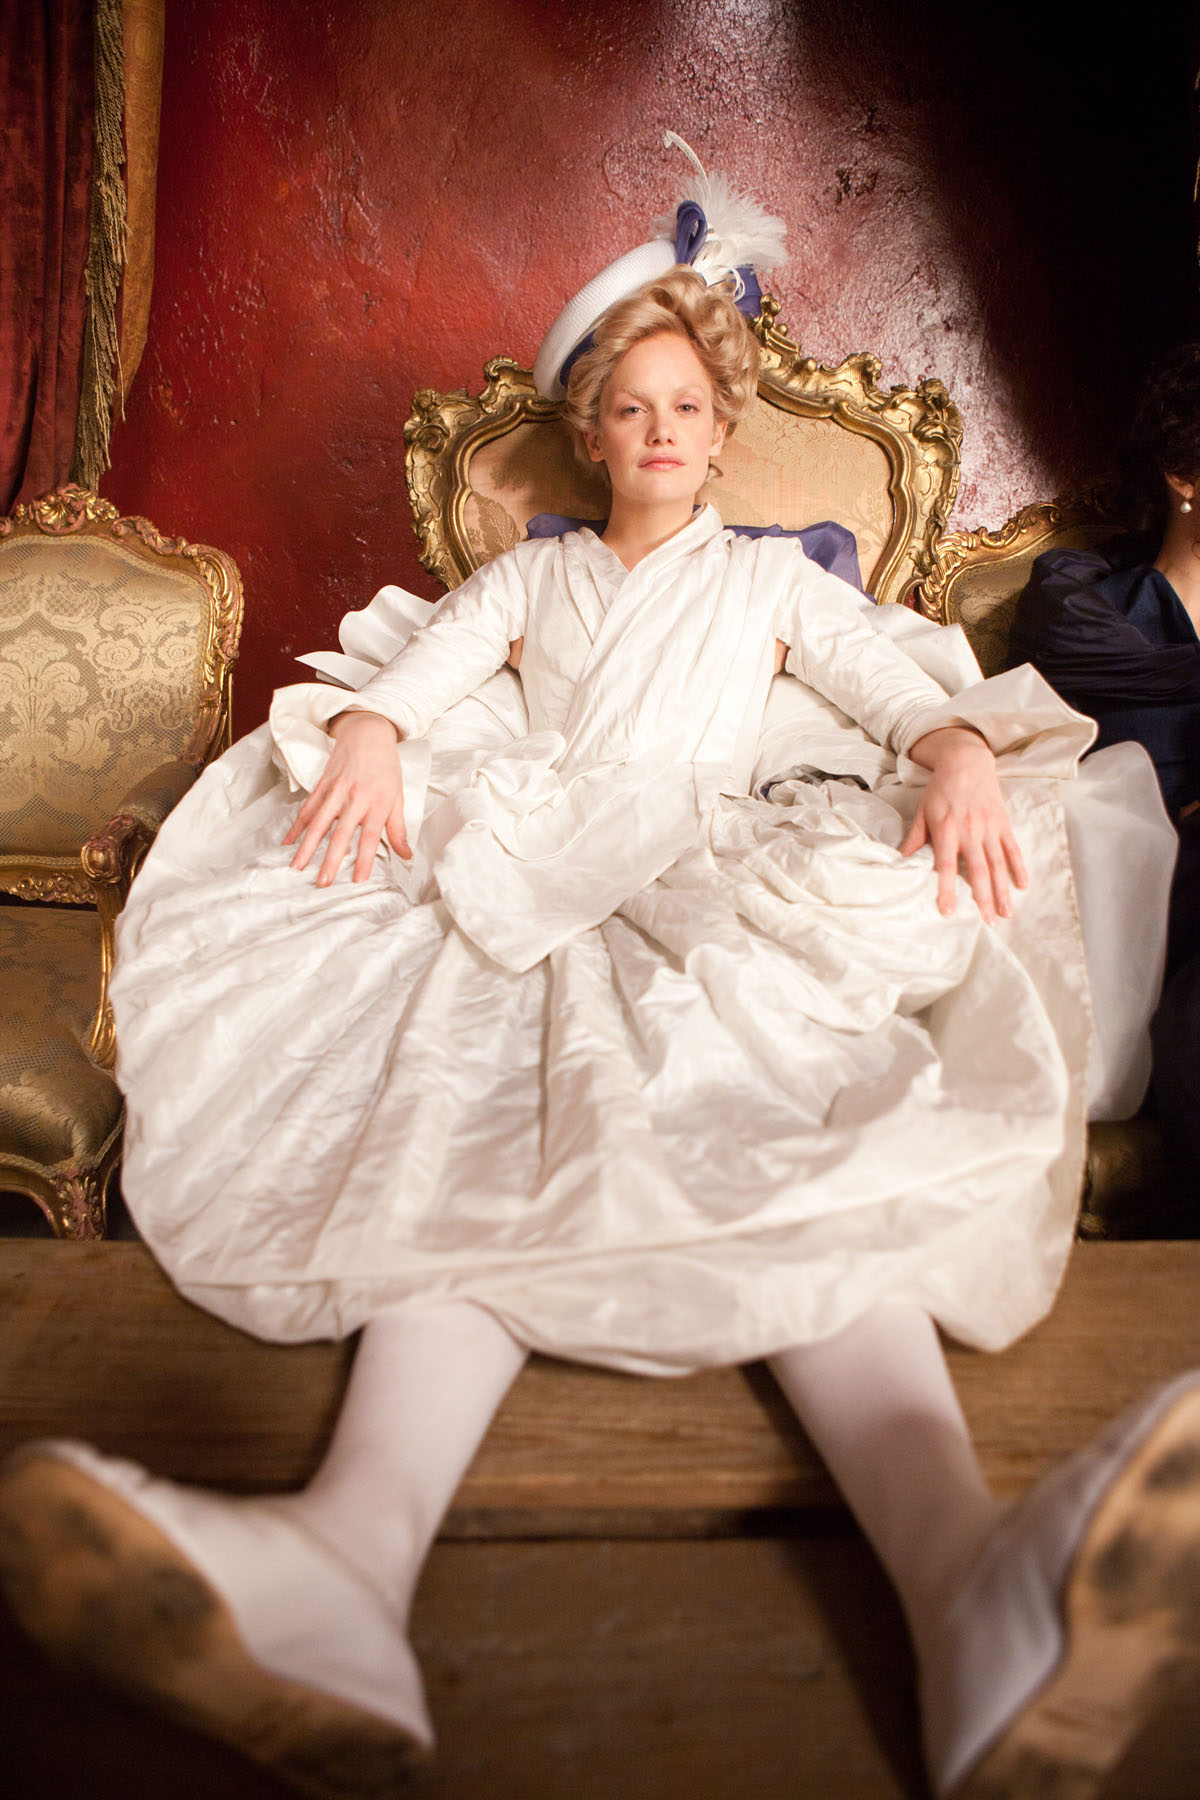 Foto de Alicia Vikander en la película Anna Karenina